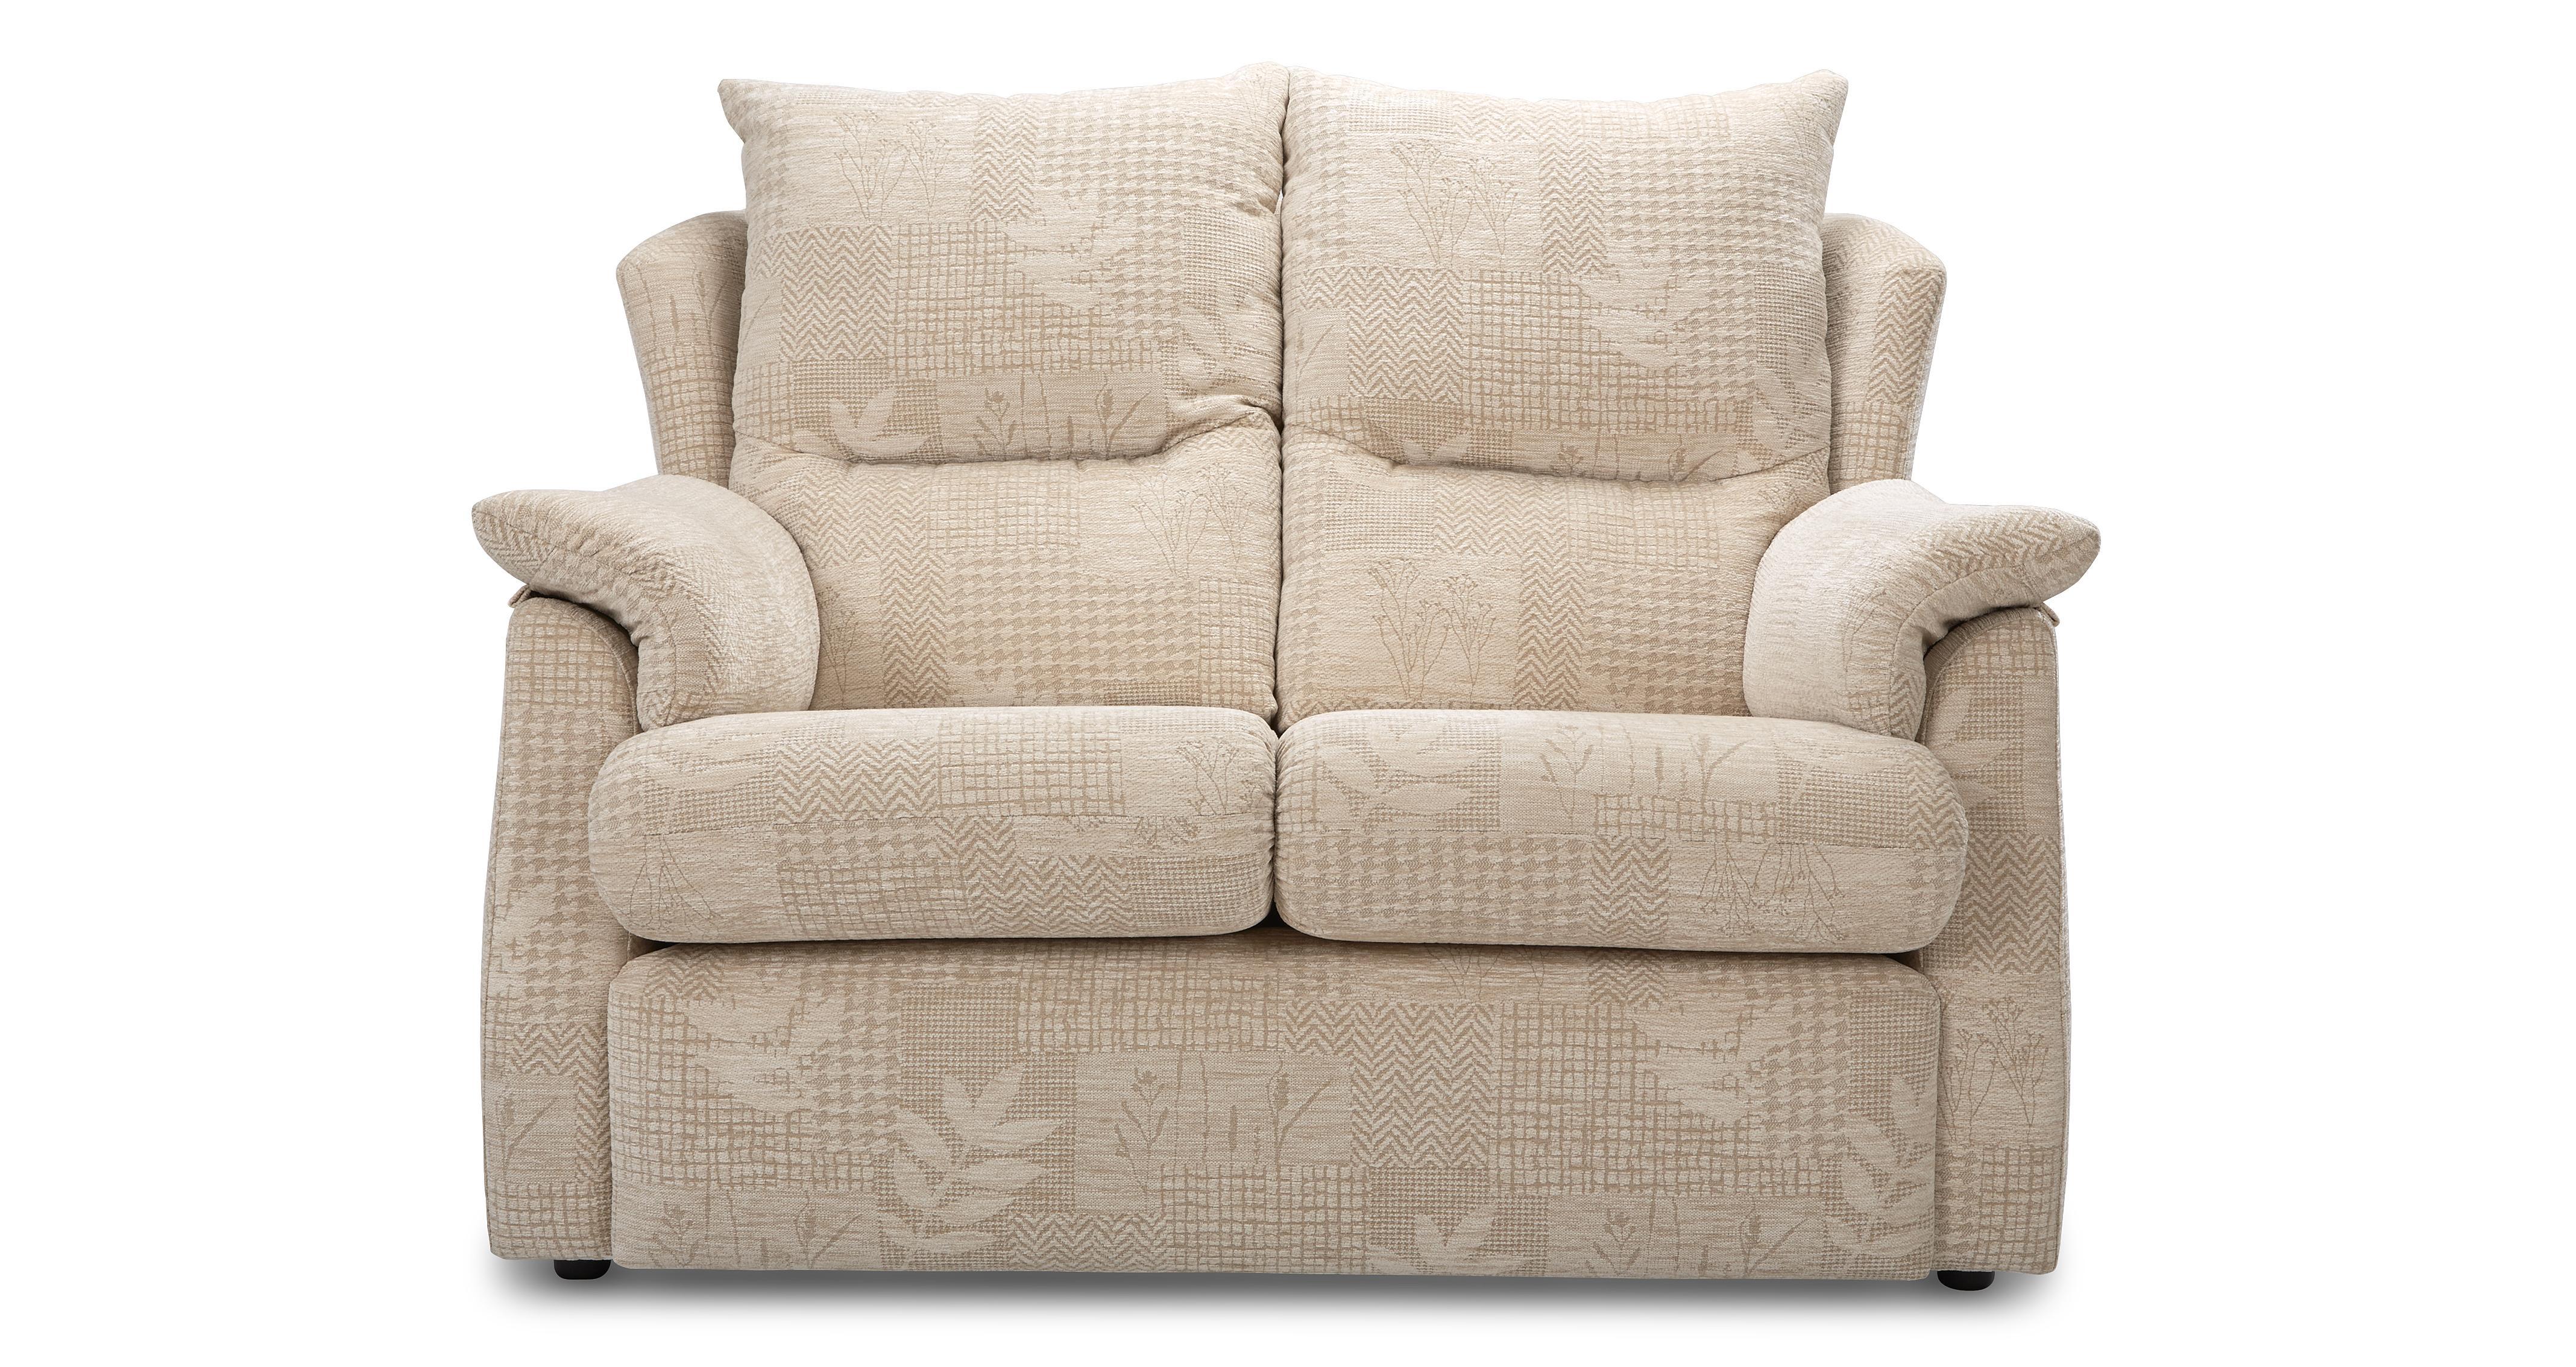 Cool Stow Fabric C Small 2 Seater Sofa Creativecarmelina Interior Chair Design Creativecarmelinacom